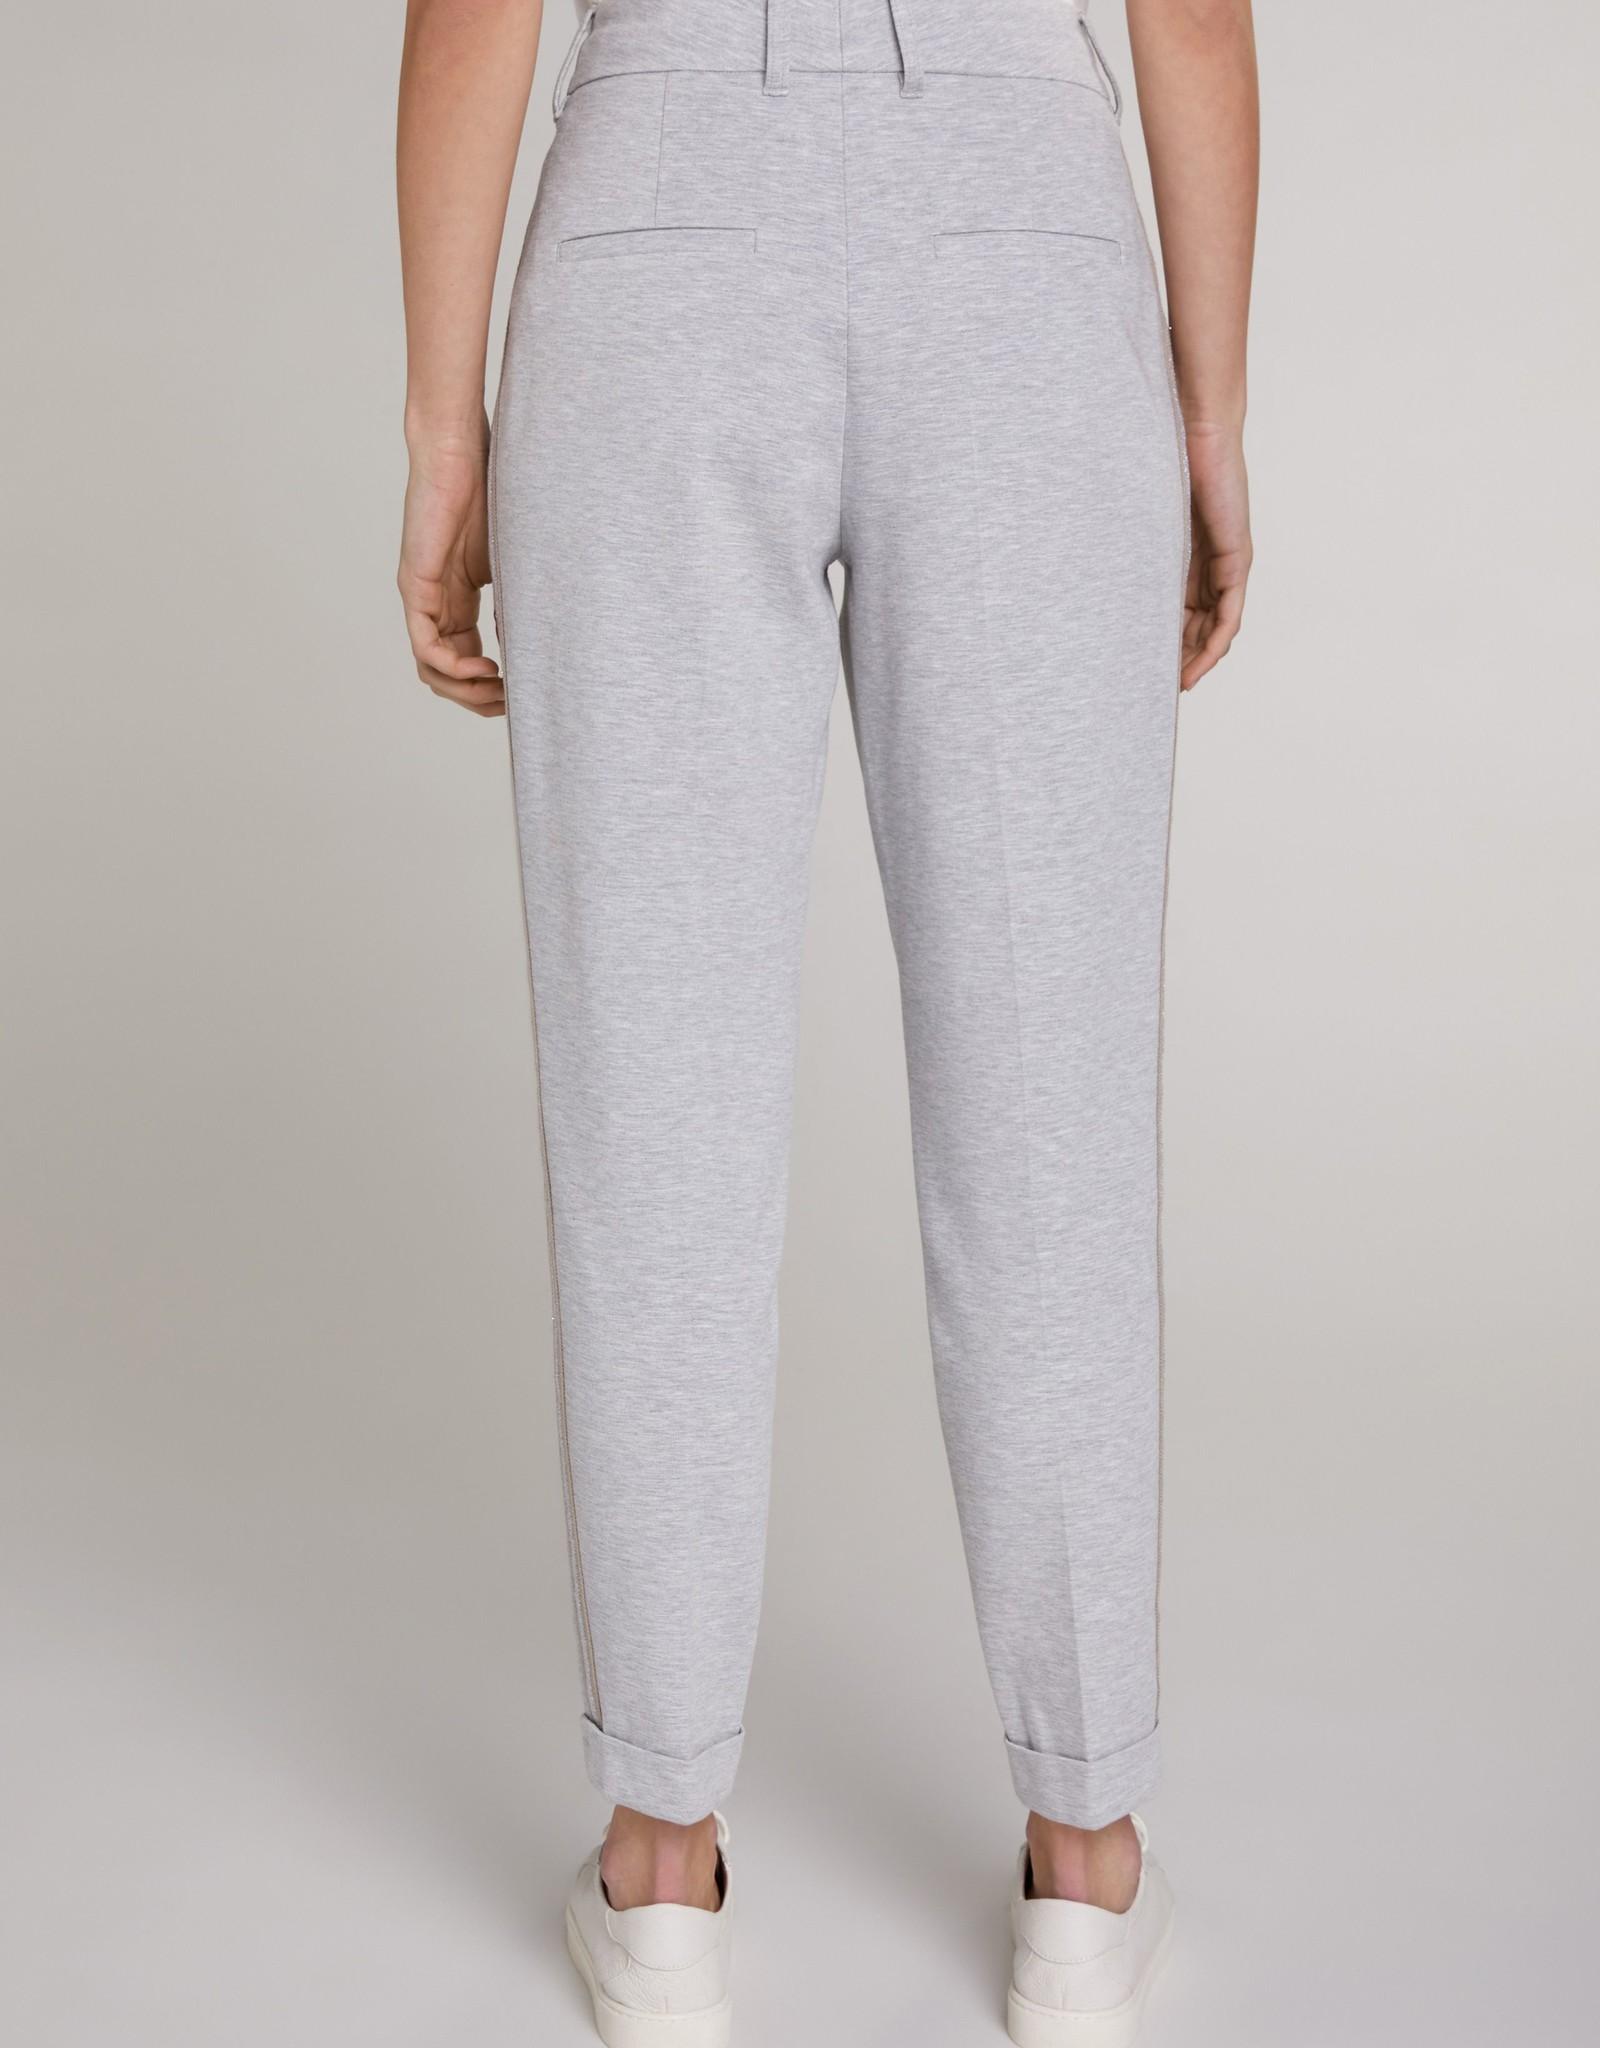 Oui Pantalon Luxury